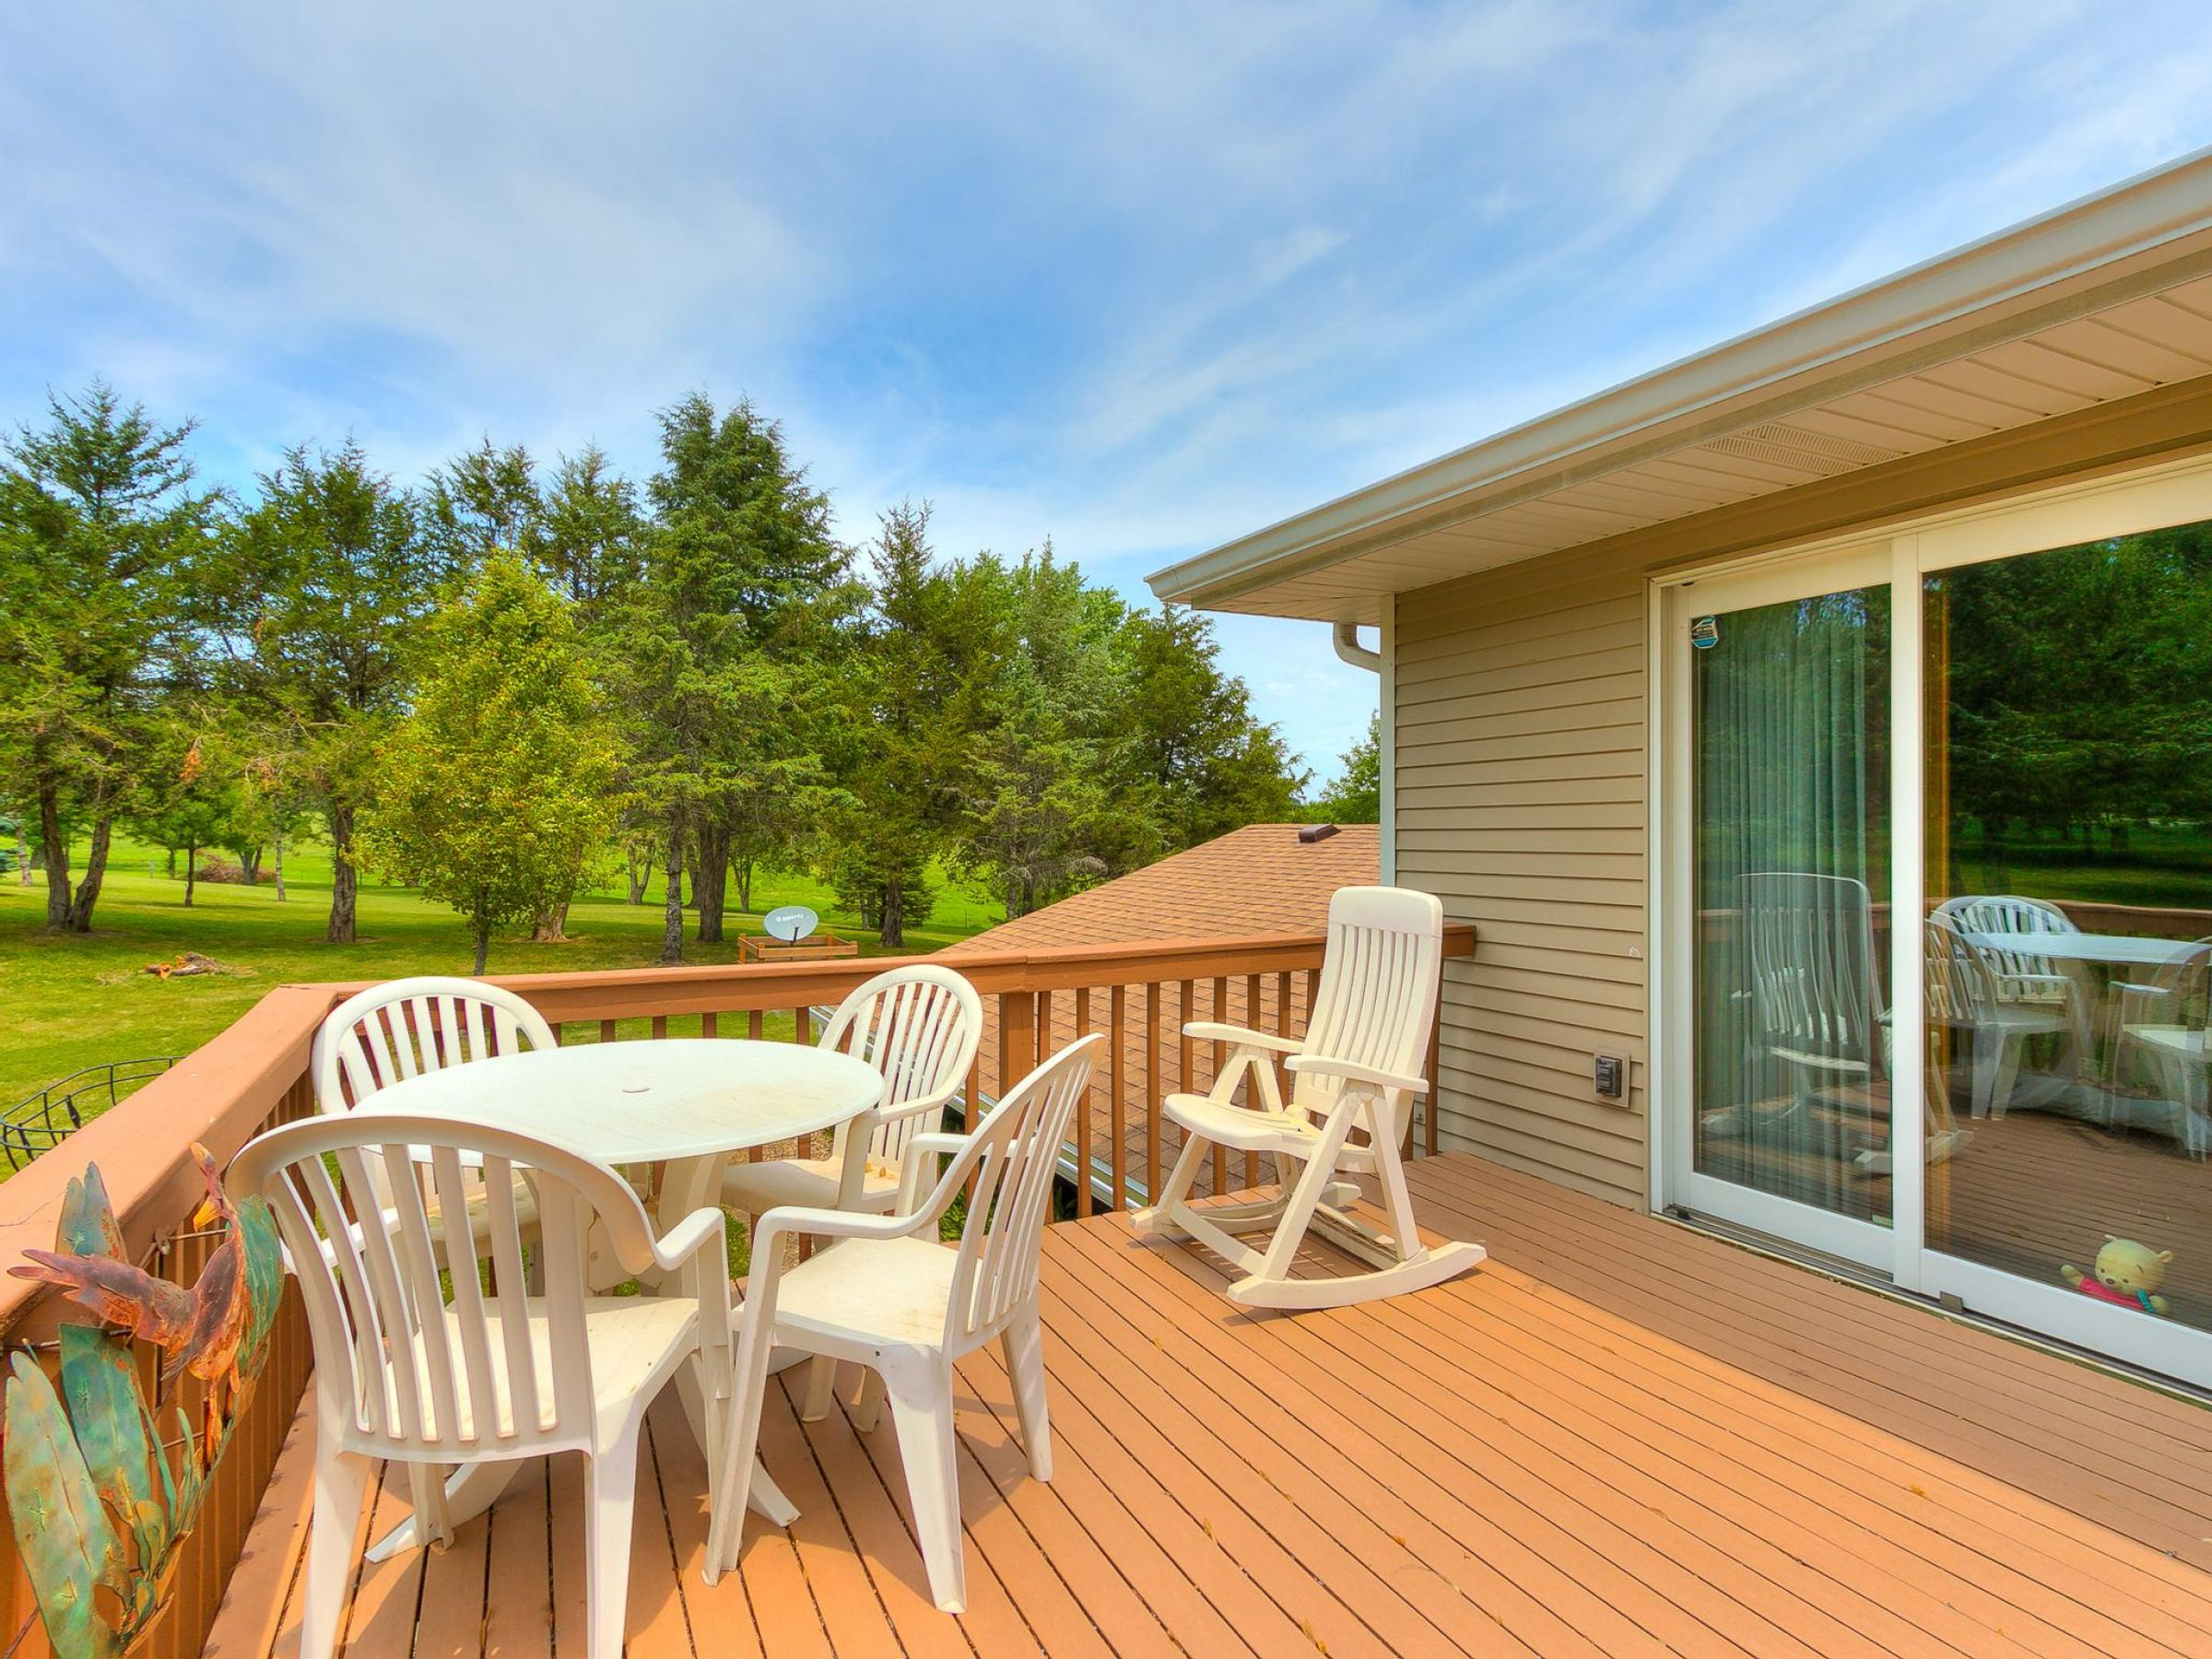 residential-warren-county-iowa-3-acres-listing-number-15593-0-2021-06-18-154727.jpg